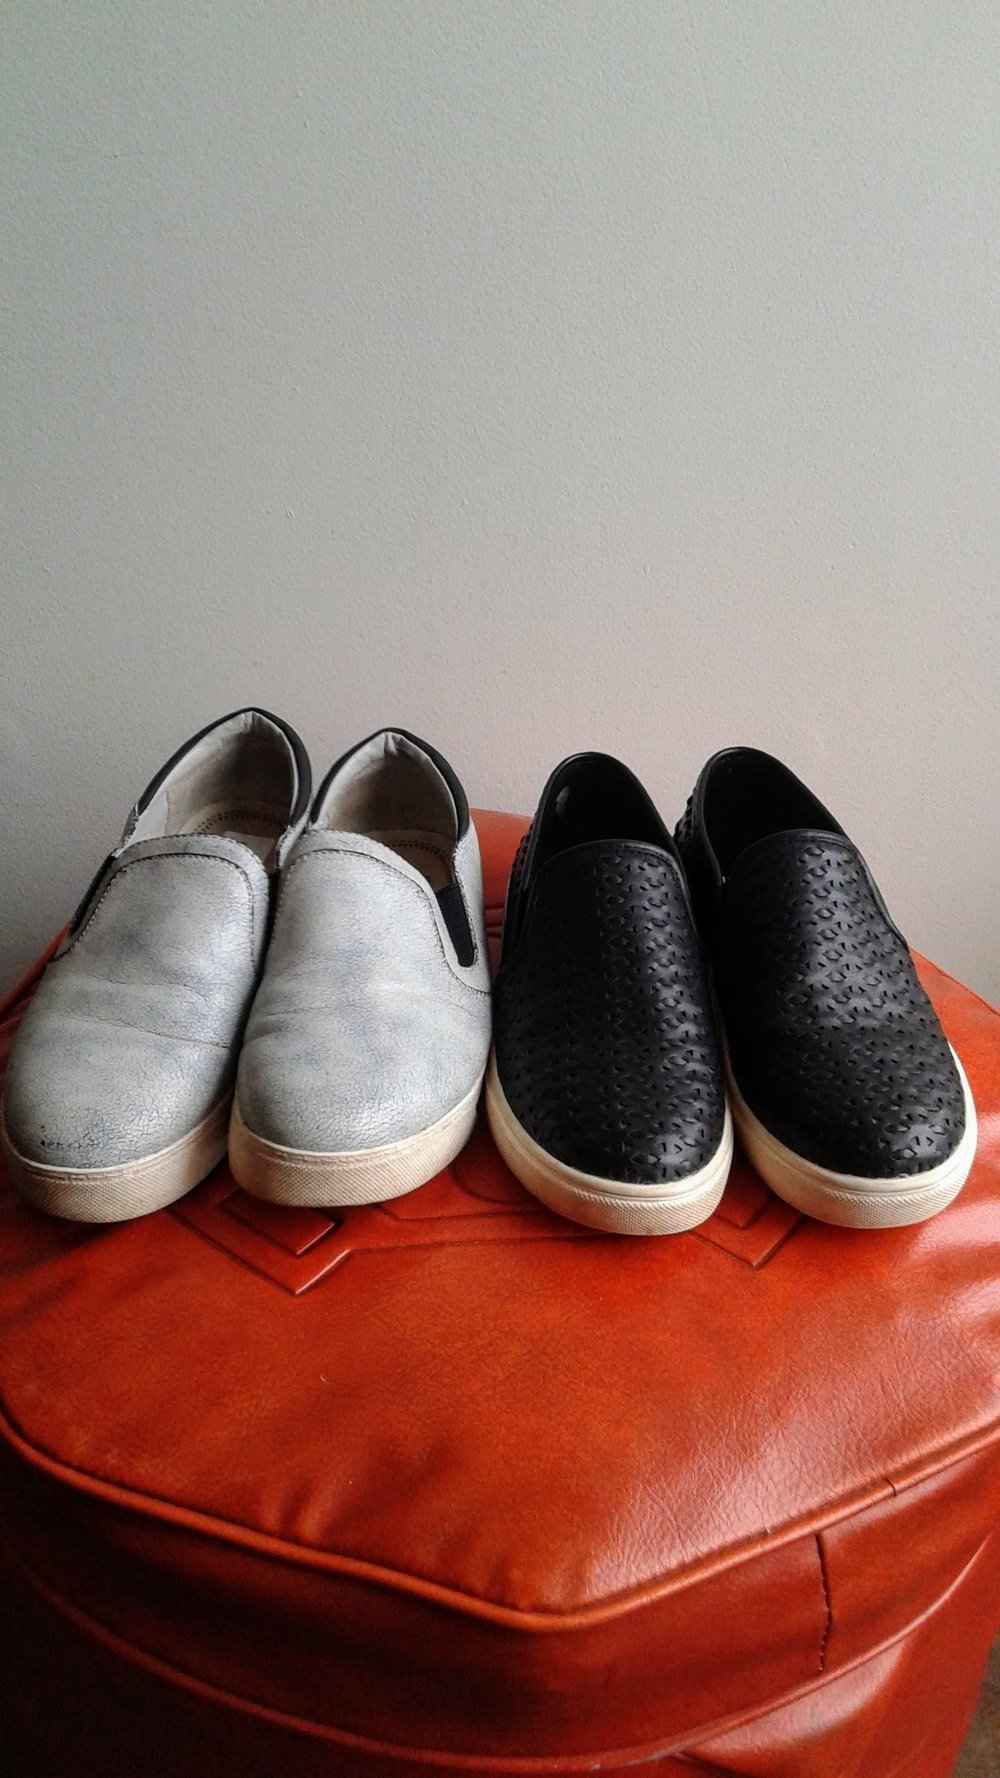 Sam Edelman  shoes; S7, $26;  Steve Madden  shoes; S7, $28